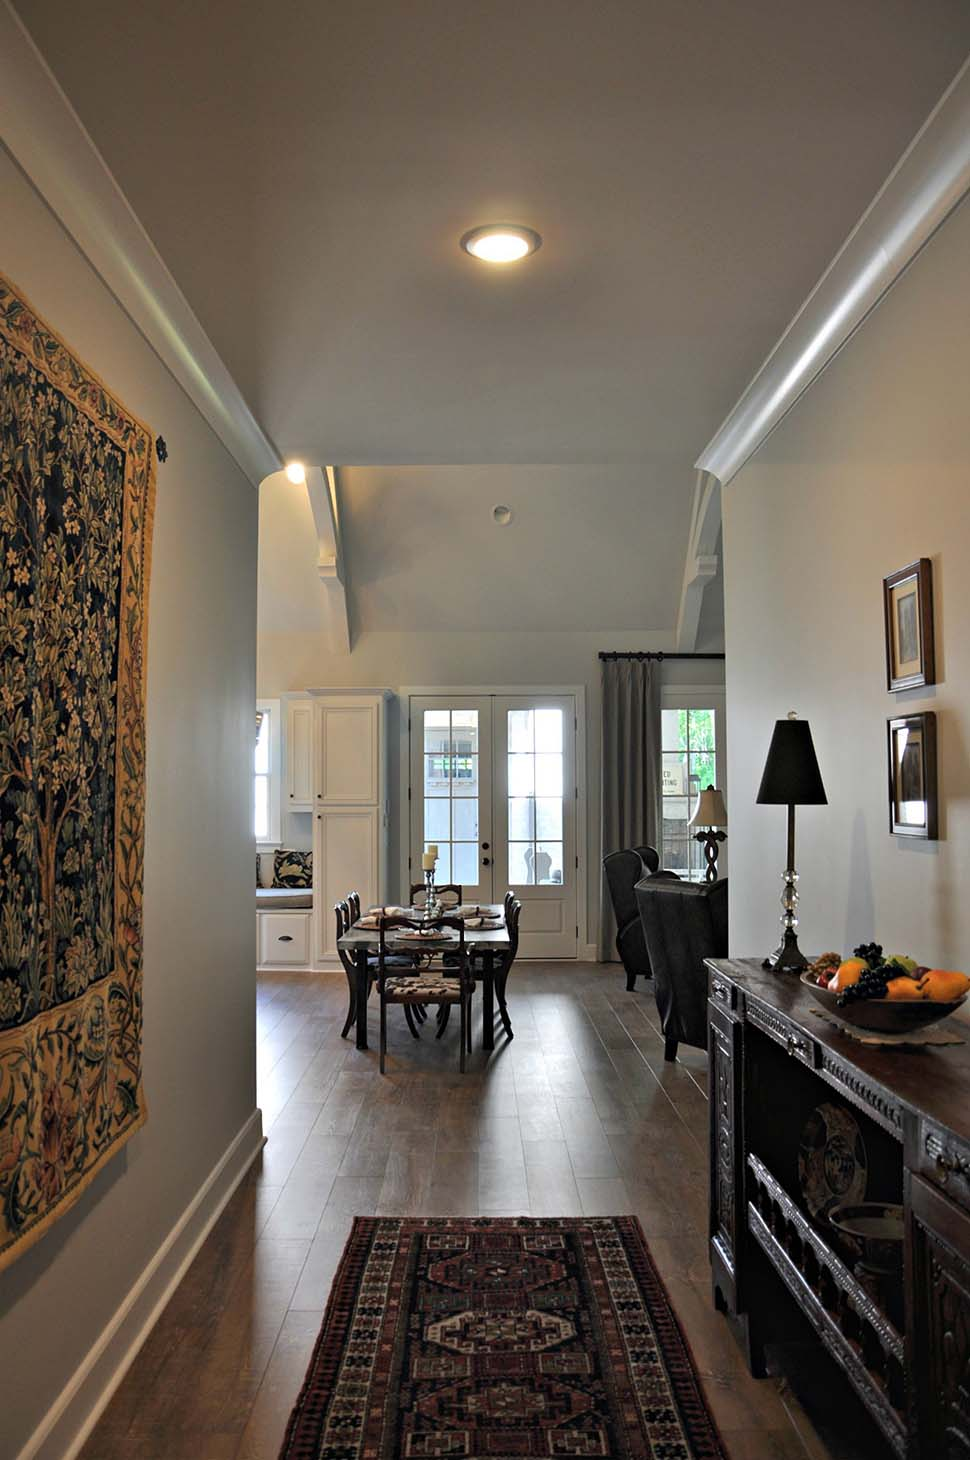 Bungalow, Cottage, Craftsman, European, Tudor House Plan 78516 with 3 Beds, 3 Baths, 2 Car Garage Picture 11